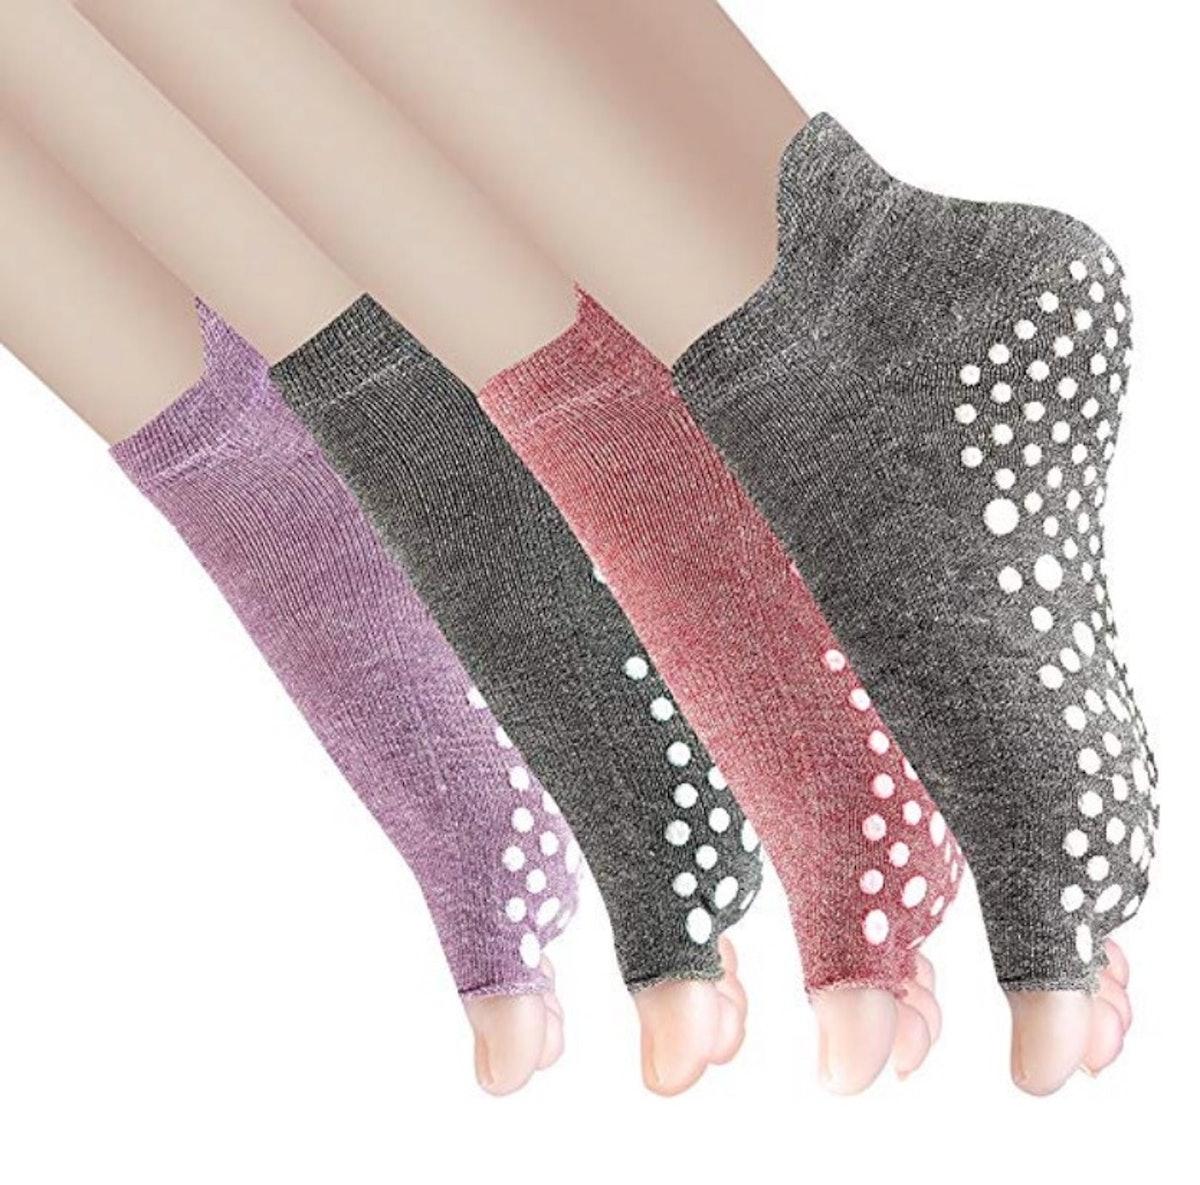 Cosfash Yoga Socks (4 Pack)